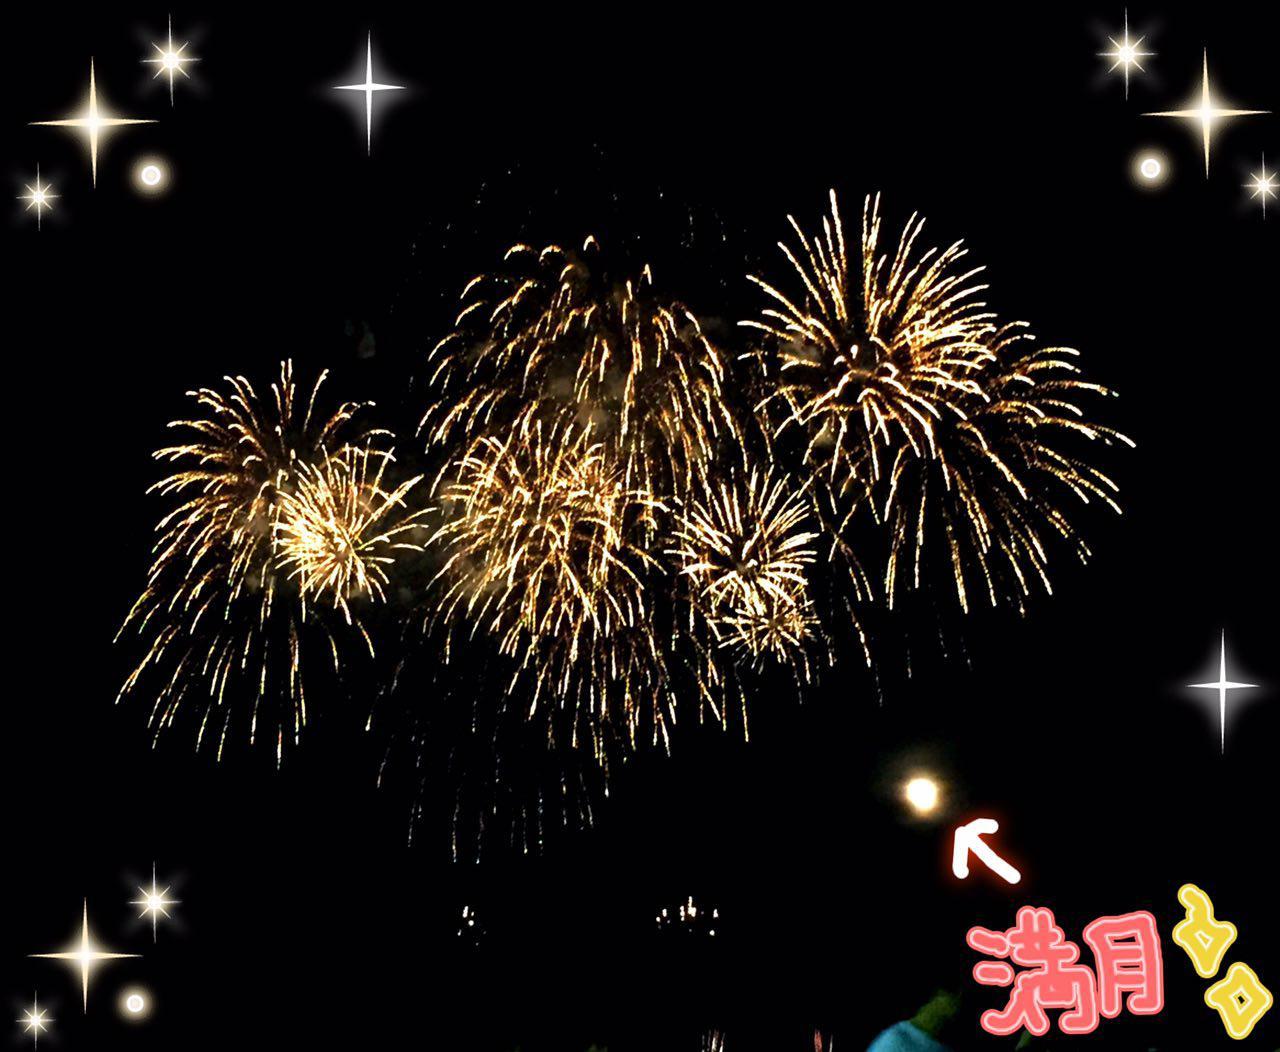 photo_2017-07-09_23-39-58.jpg